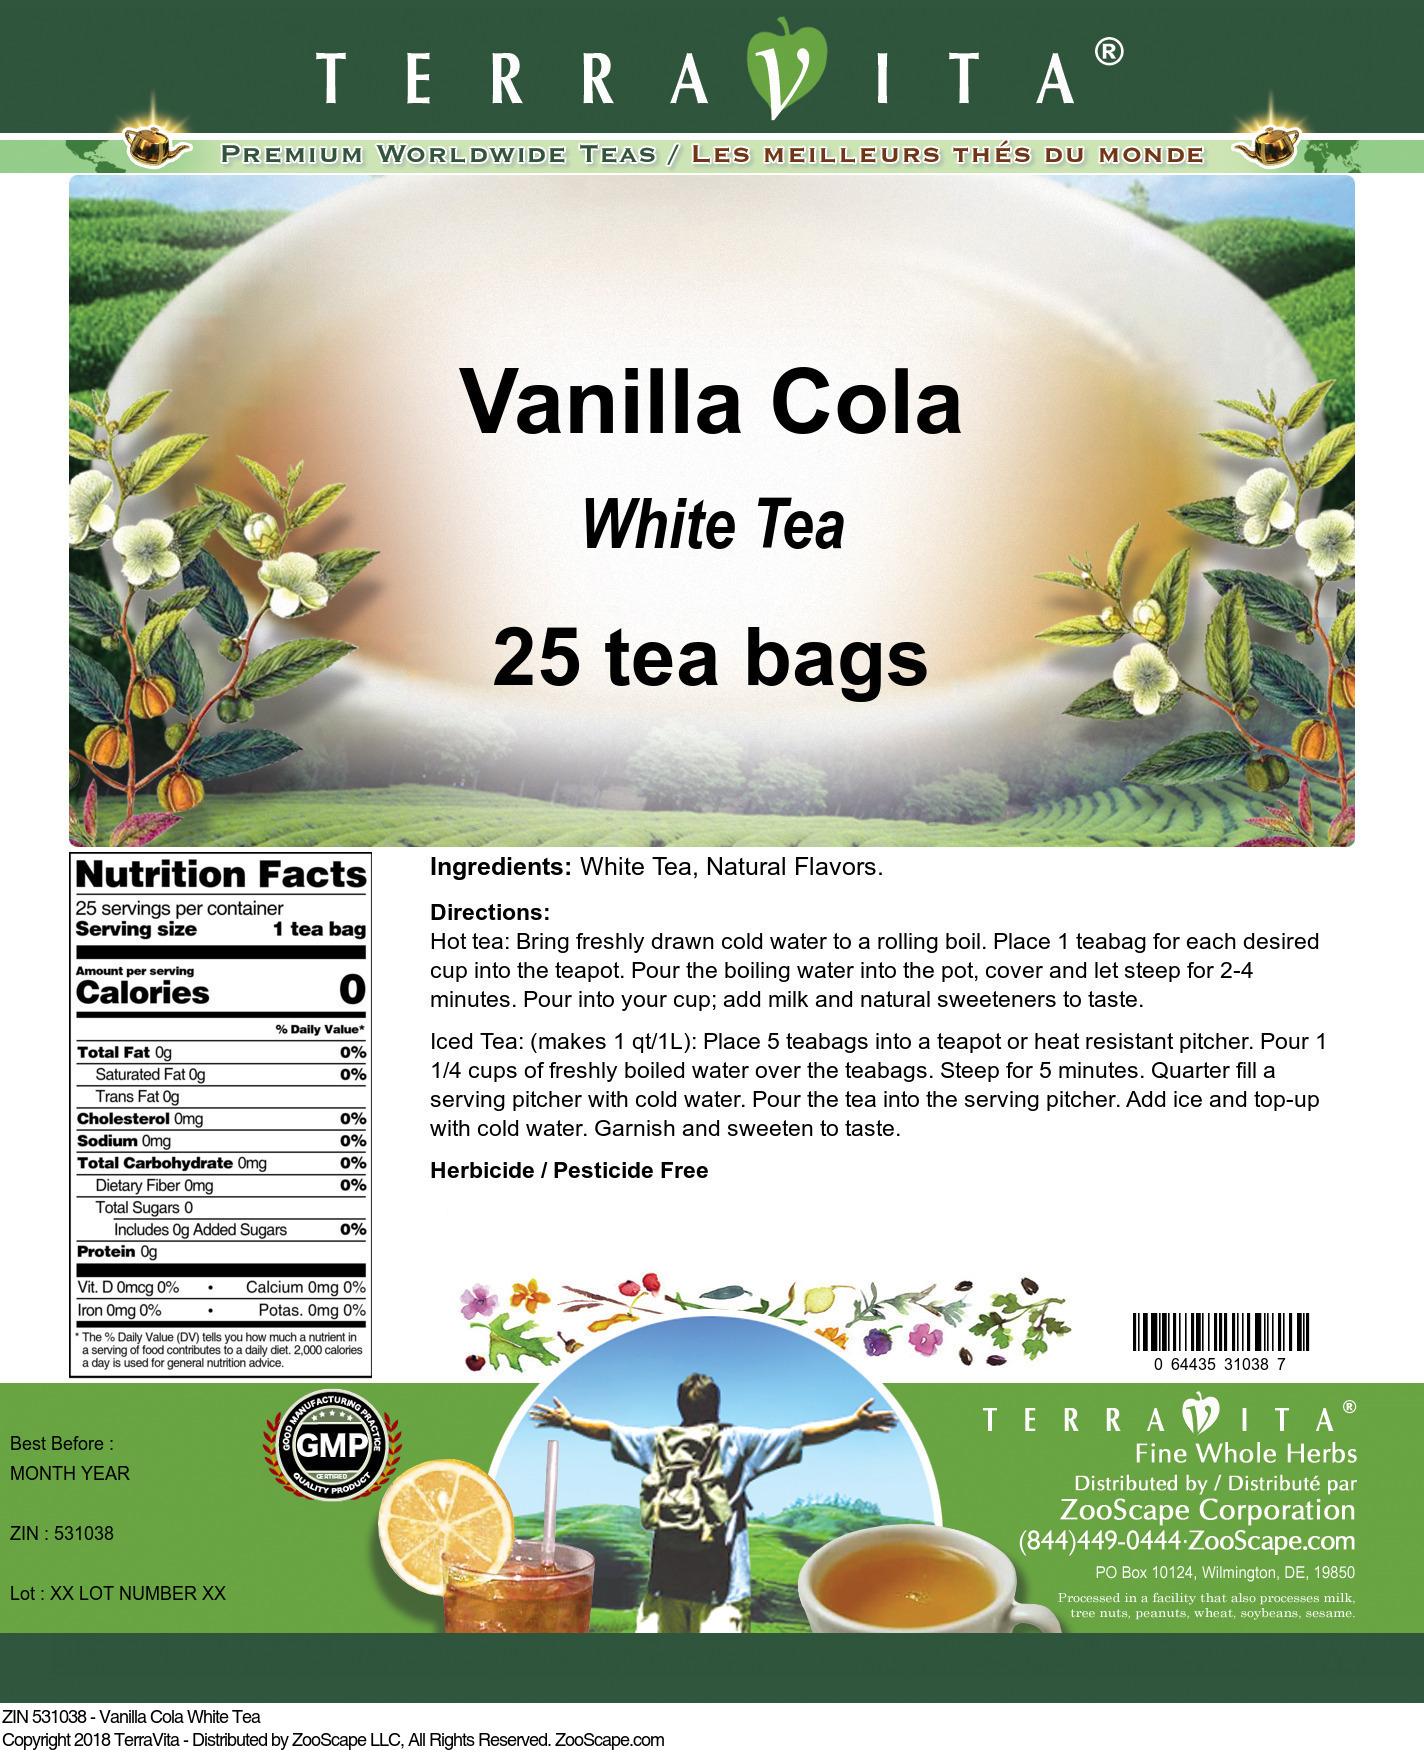 Vanilla Cola White Tea